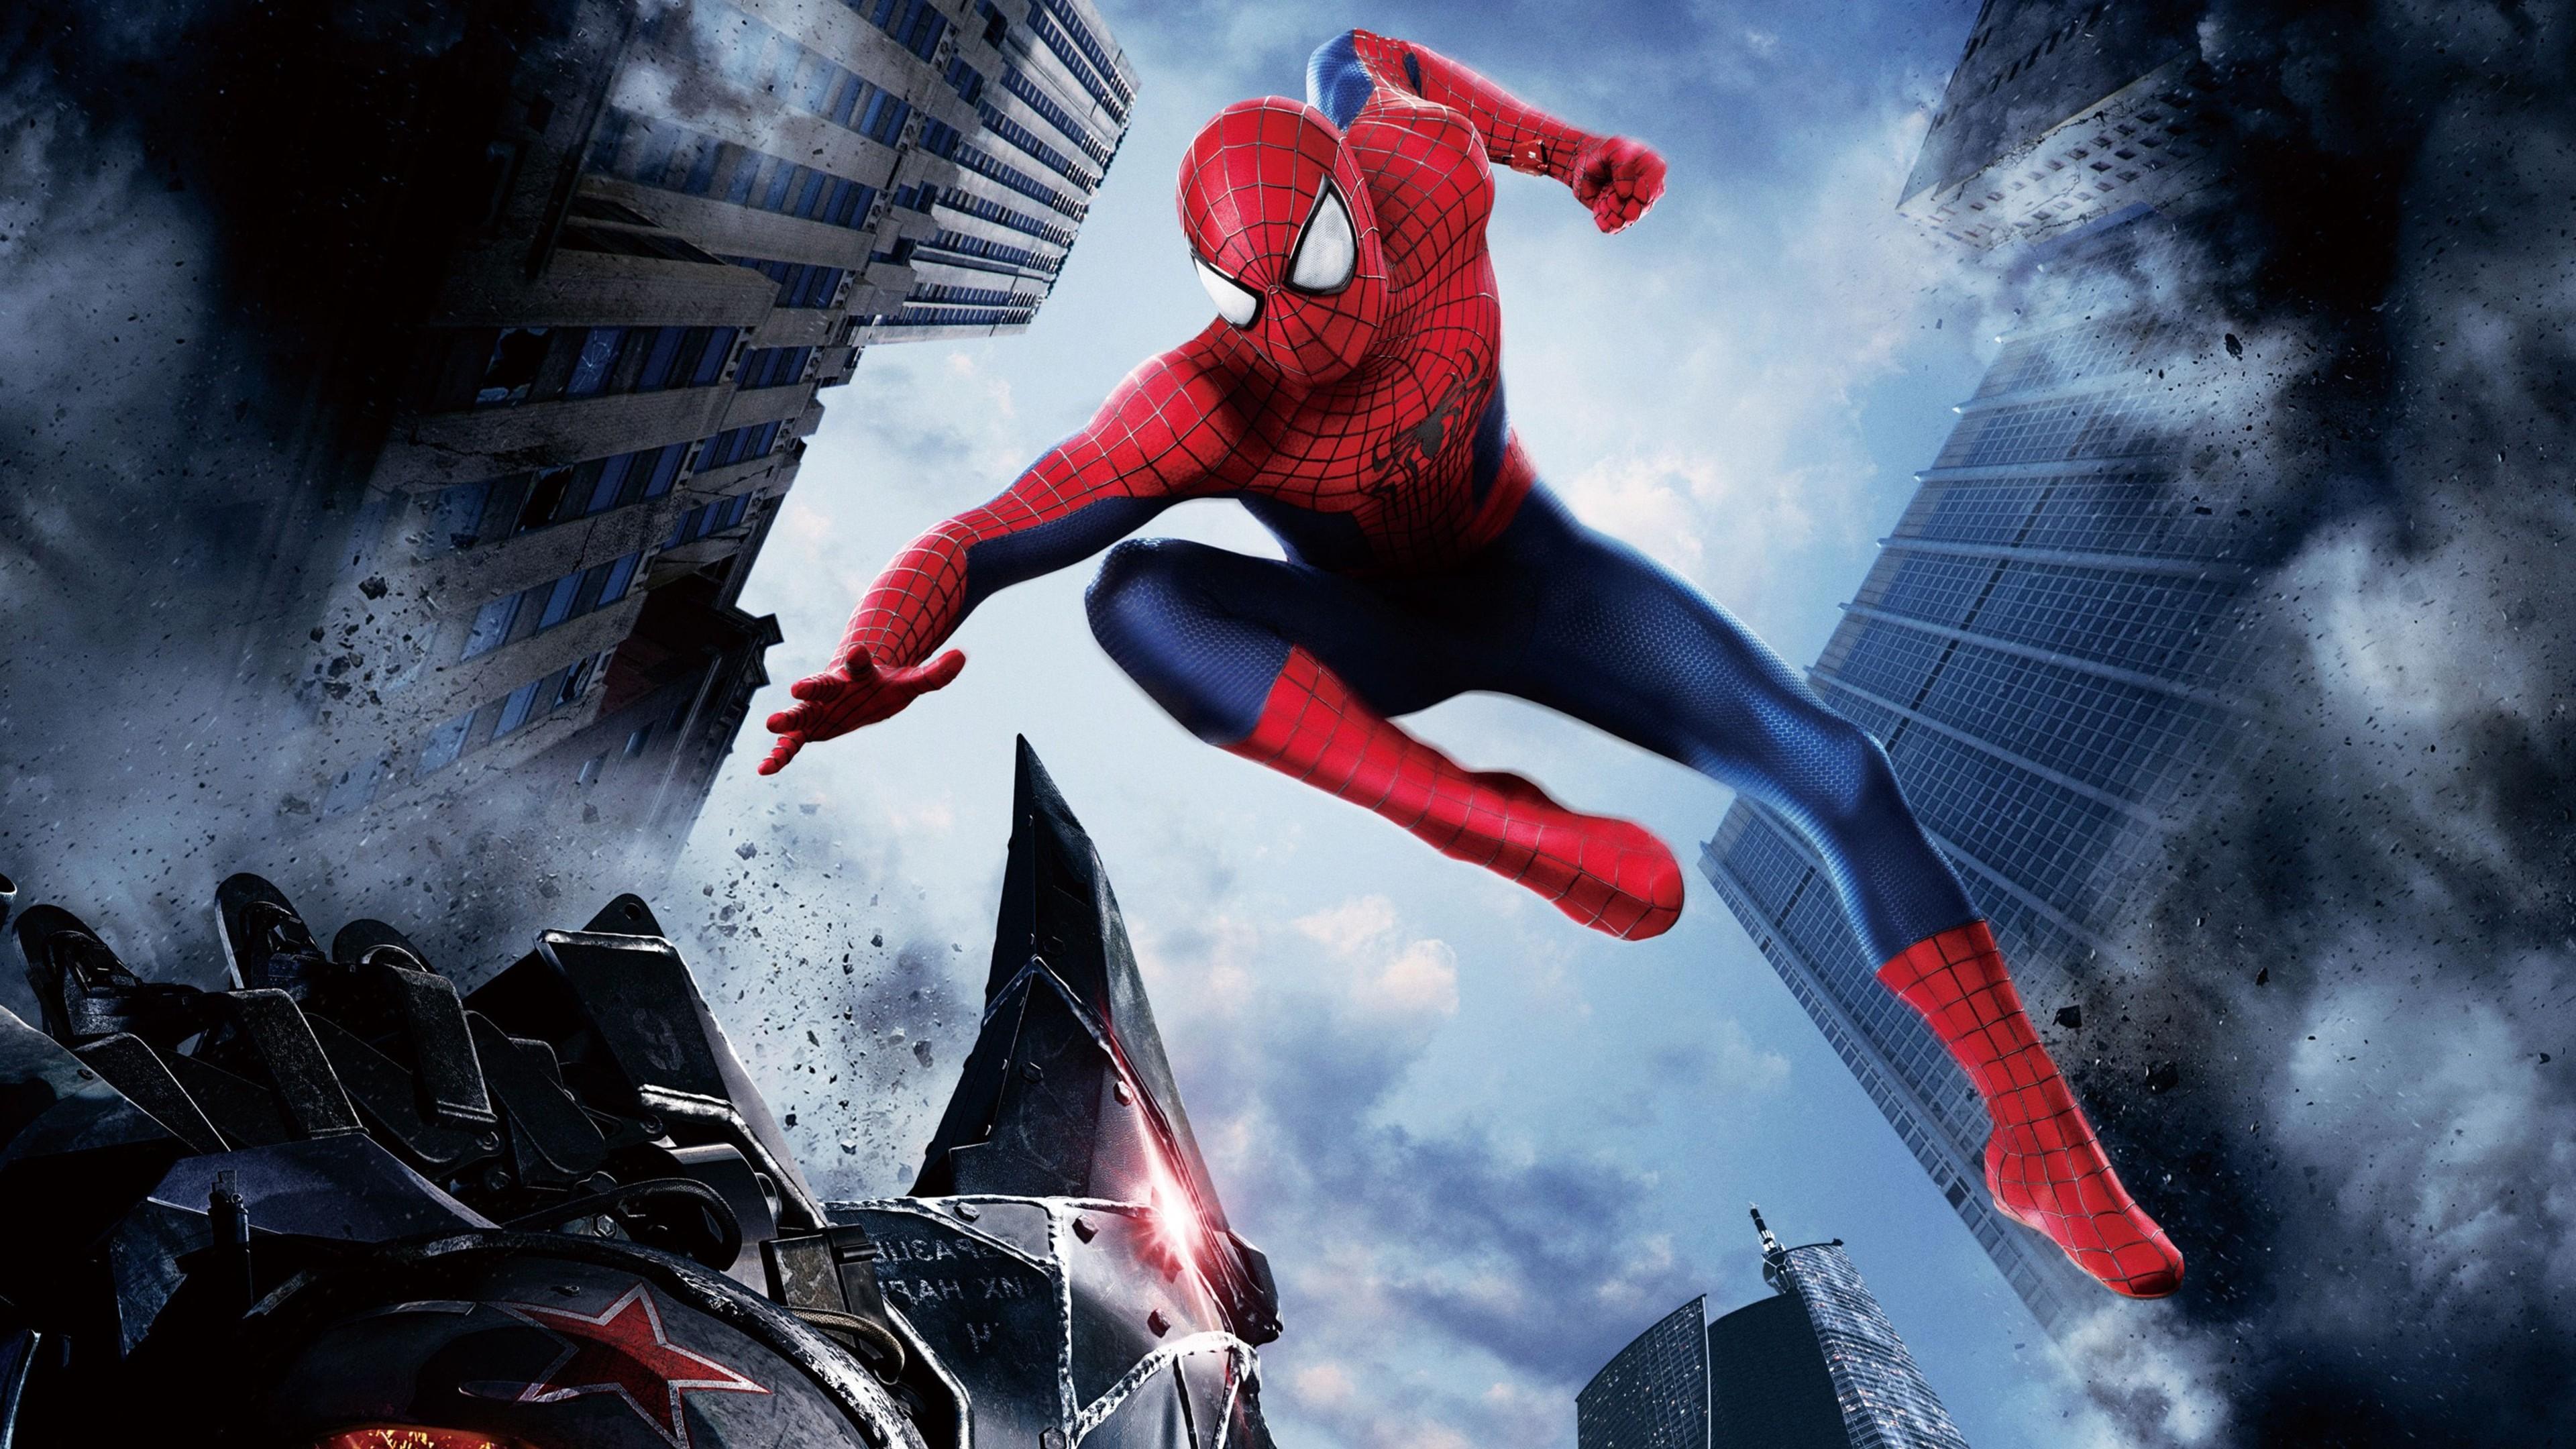 2048x1152 the amazing spider man 2048x1152 resolution hd 4k